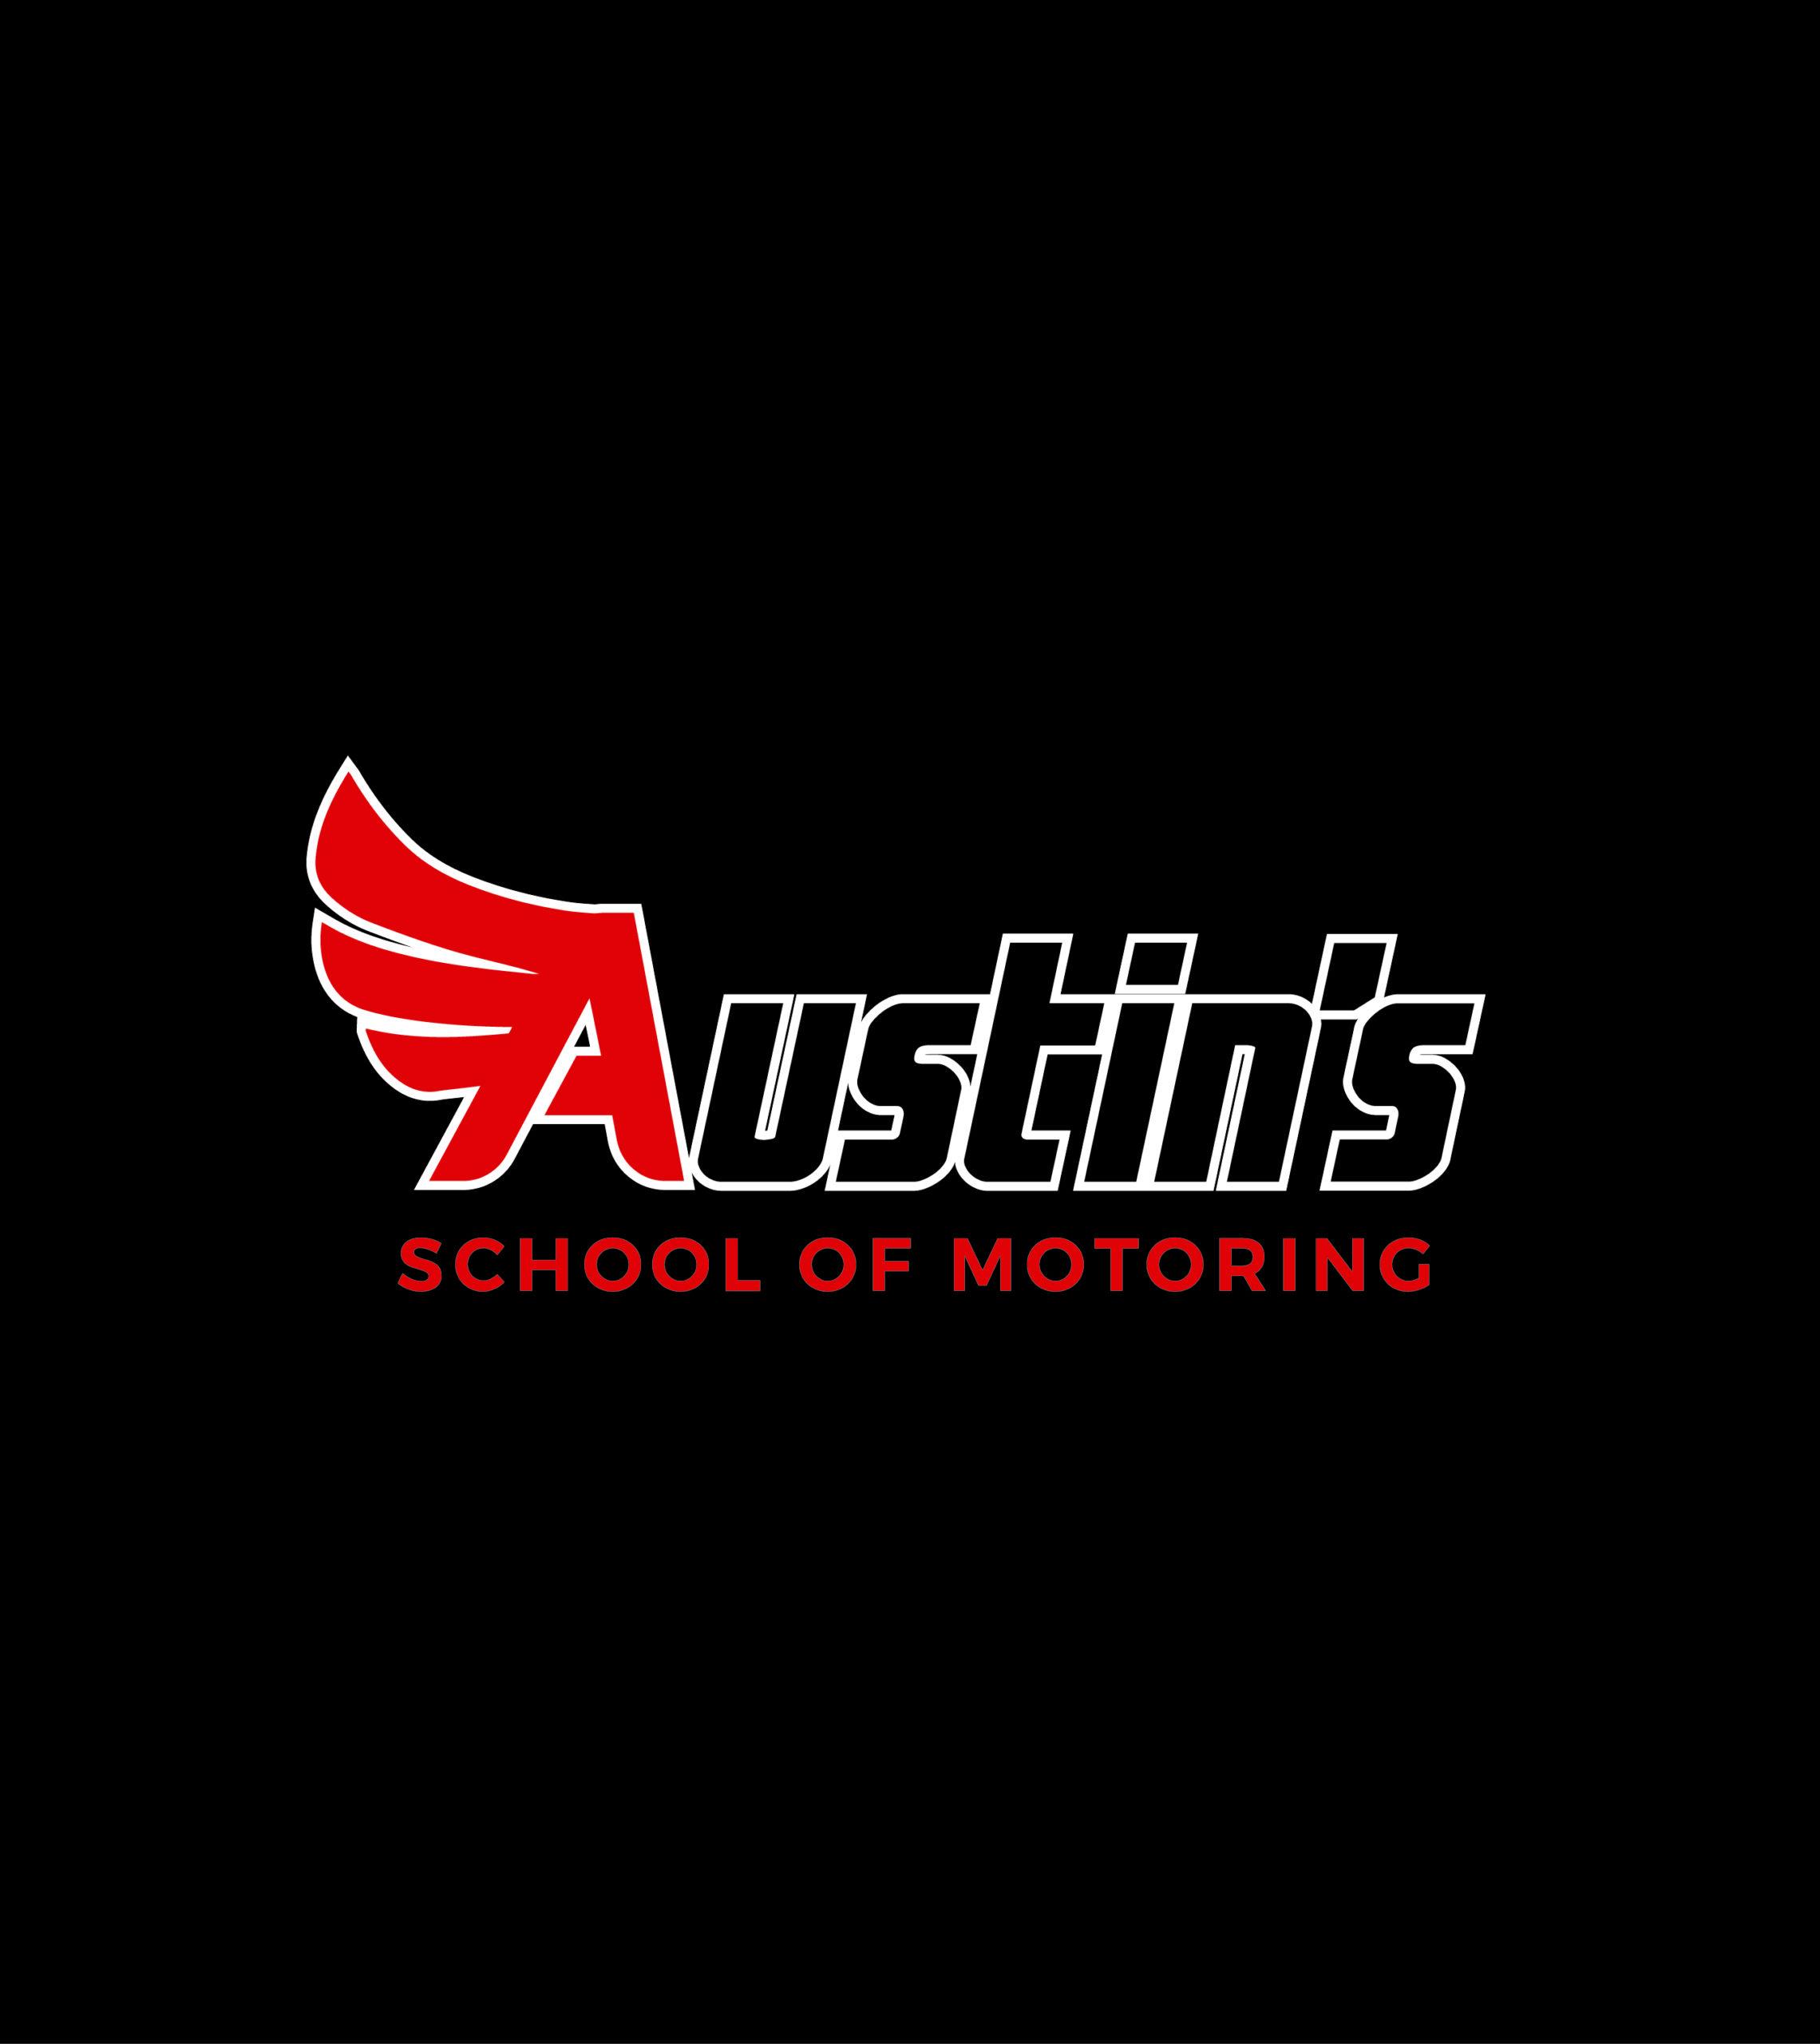 Austin's School of Motoring